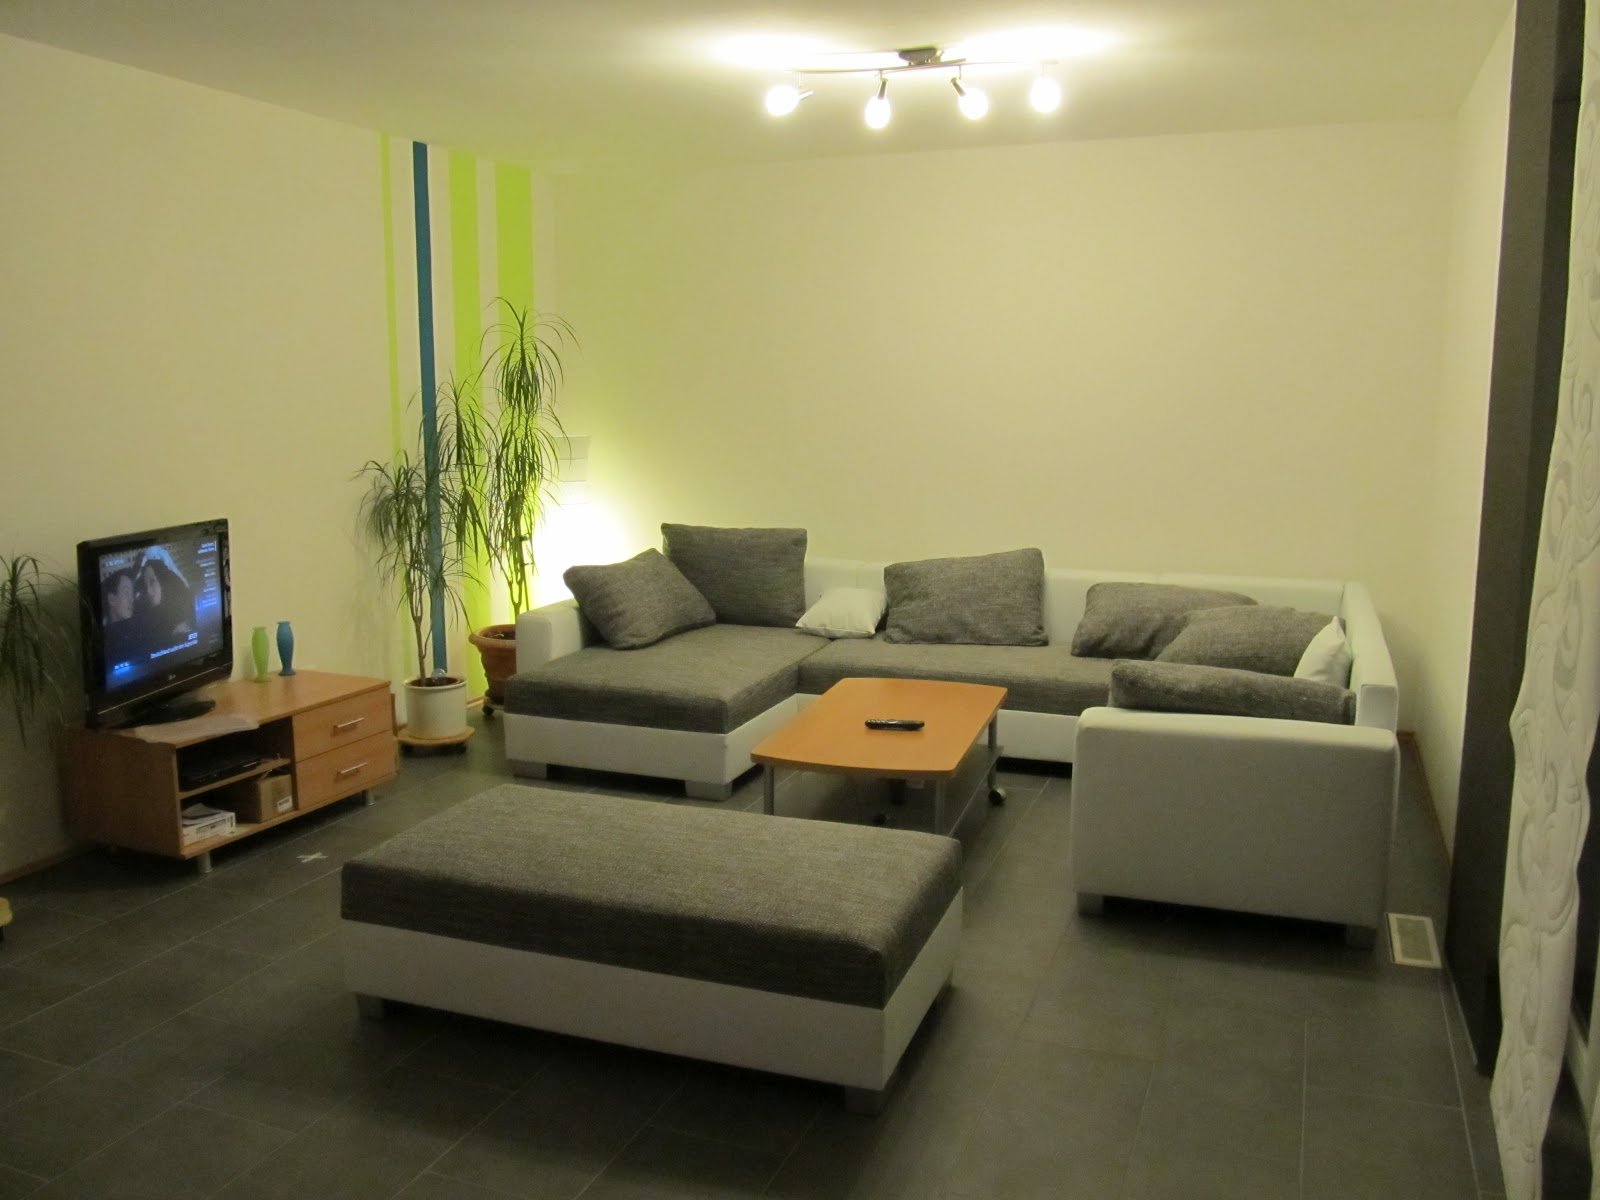 Neues Ikea Sofa 41 Makellos 2er Couch Mit